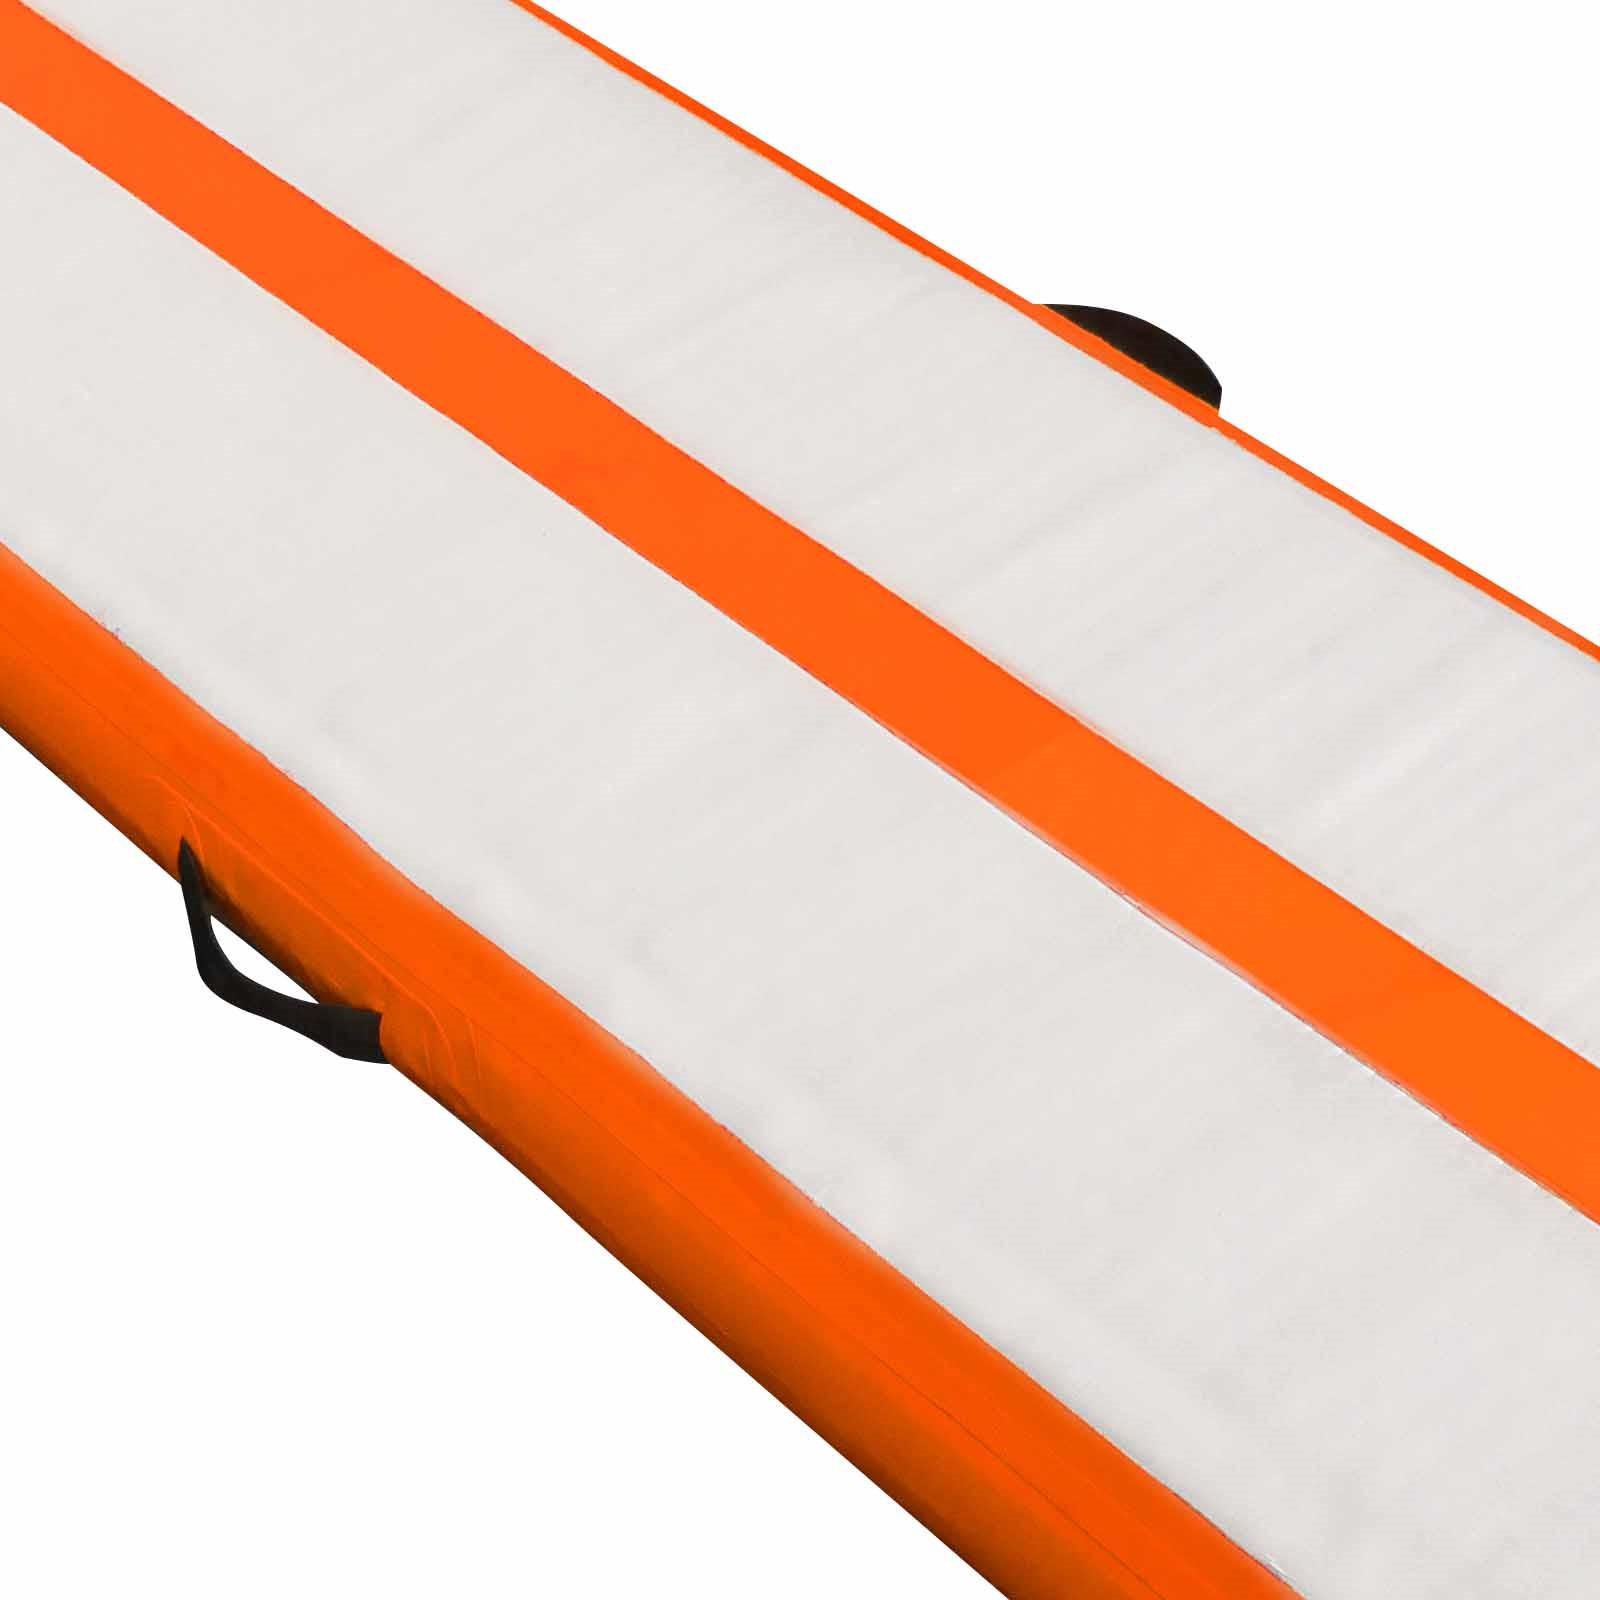 Air-Track-10x3FT-Trumbling-Airtrack-Gymnastics-Yoga-Floor-Mat-Training-Pad-Home thumbnail 164